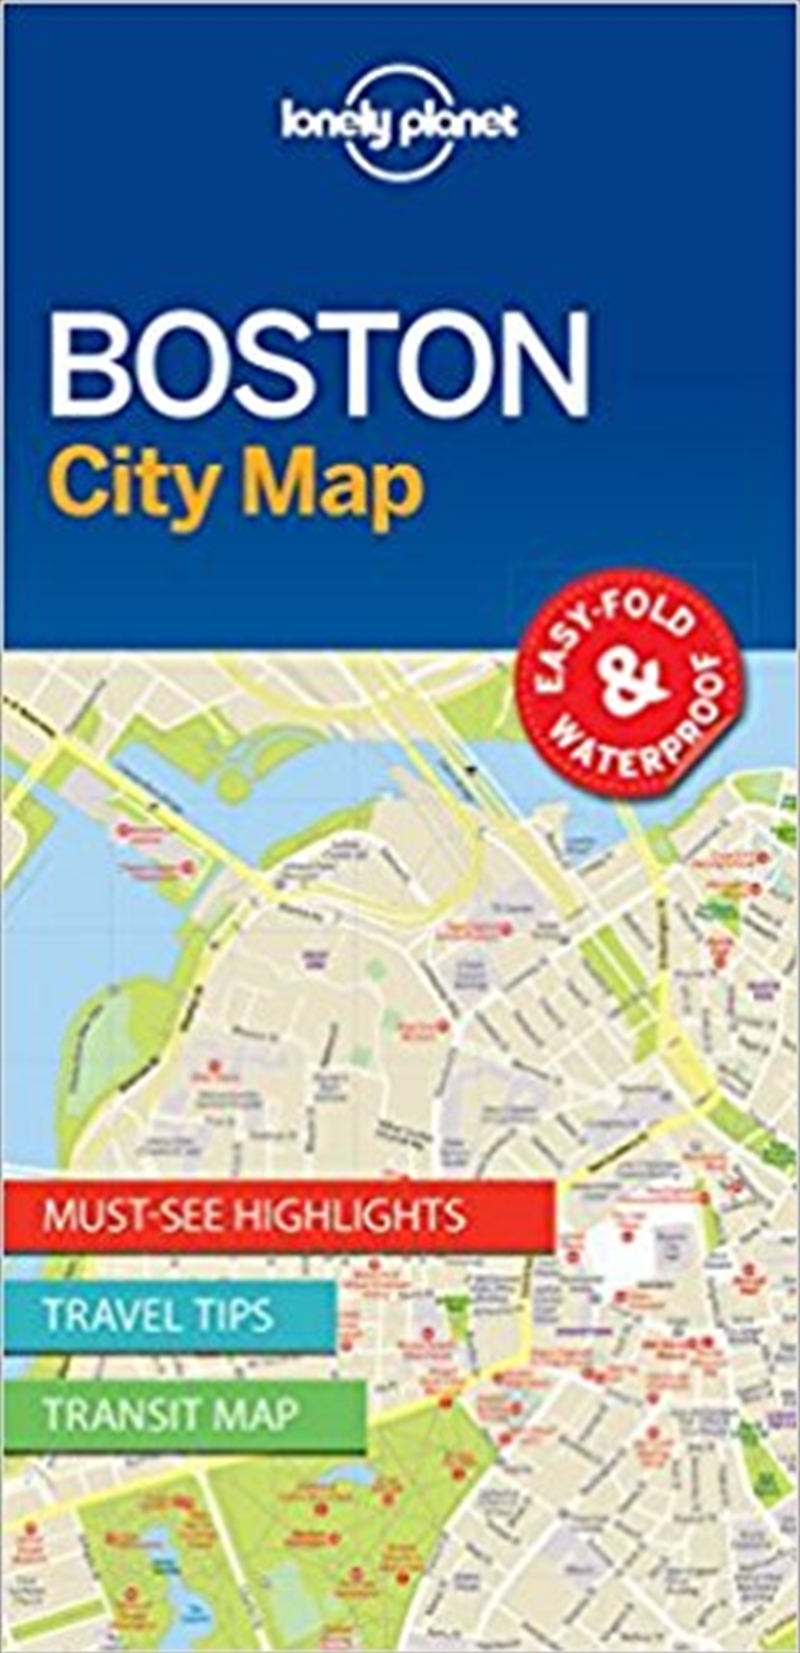 Boston City Map: Edition 1 | Sheet Map